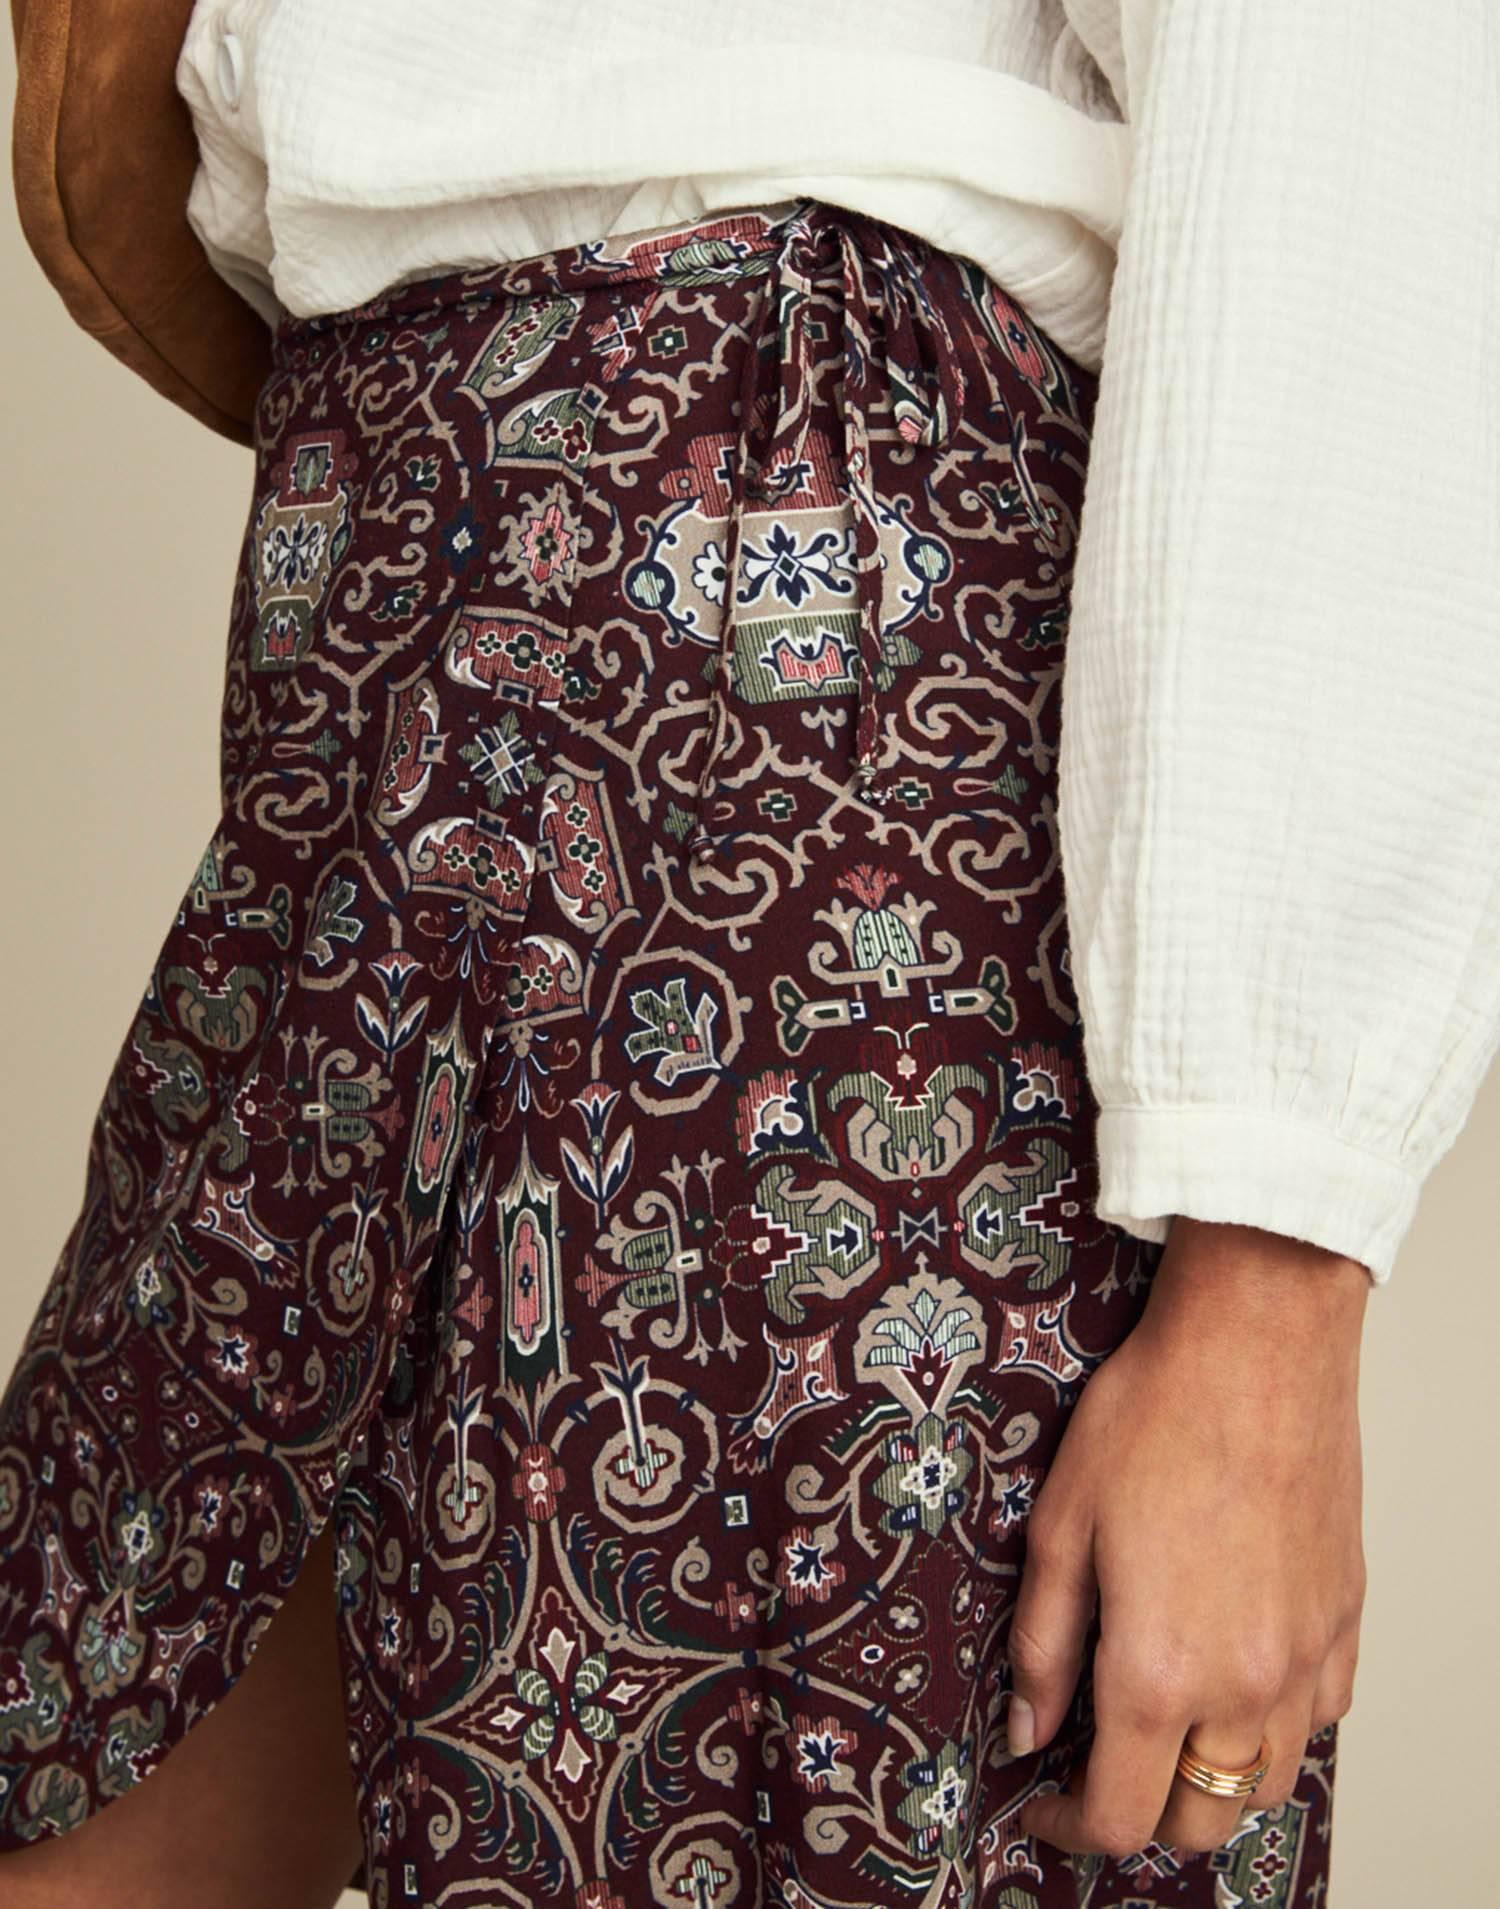 Slit mosaic printed skirt